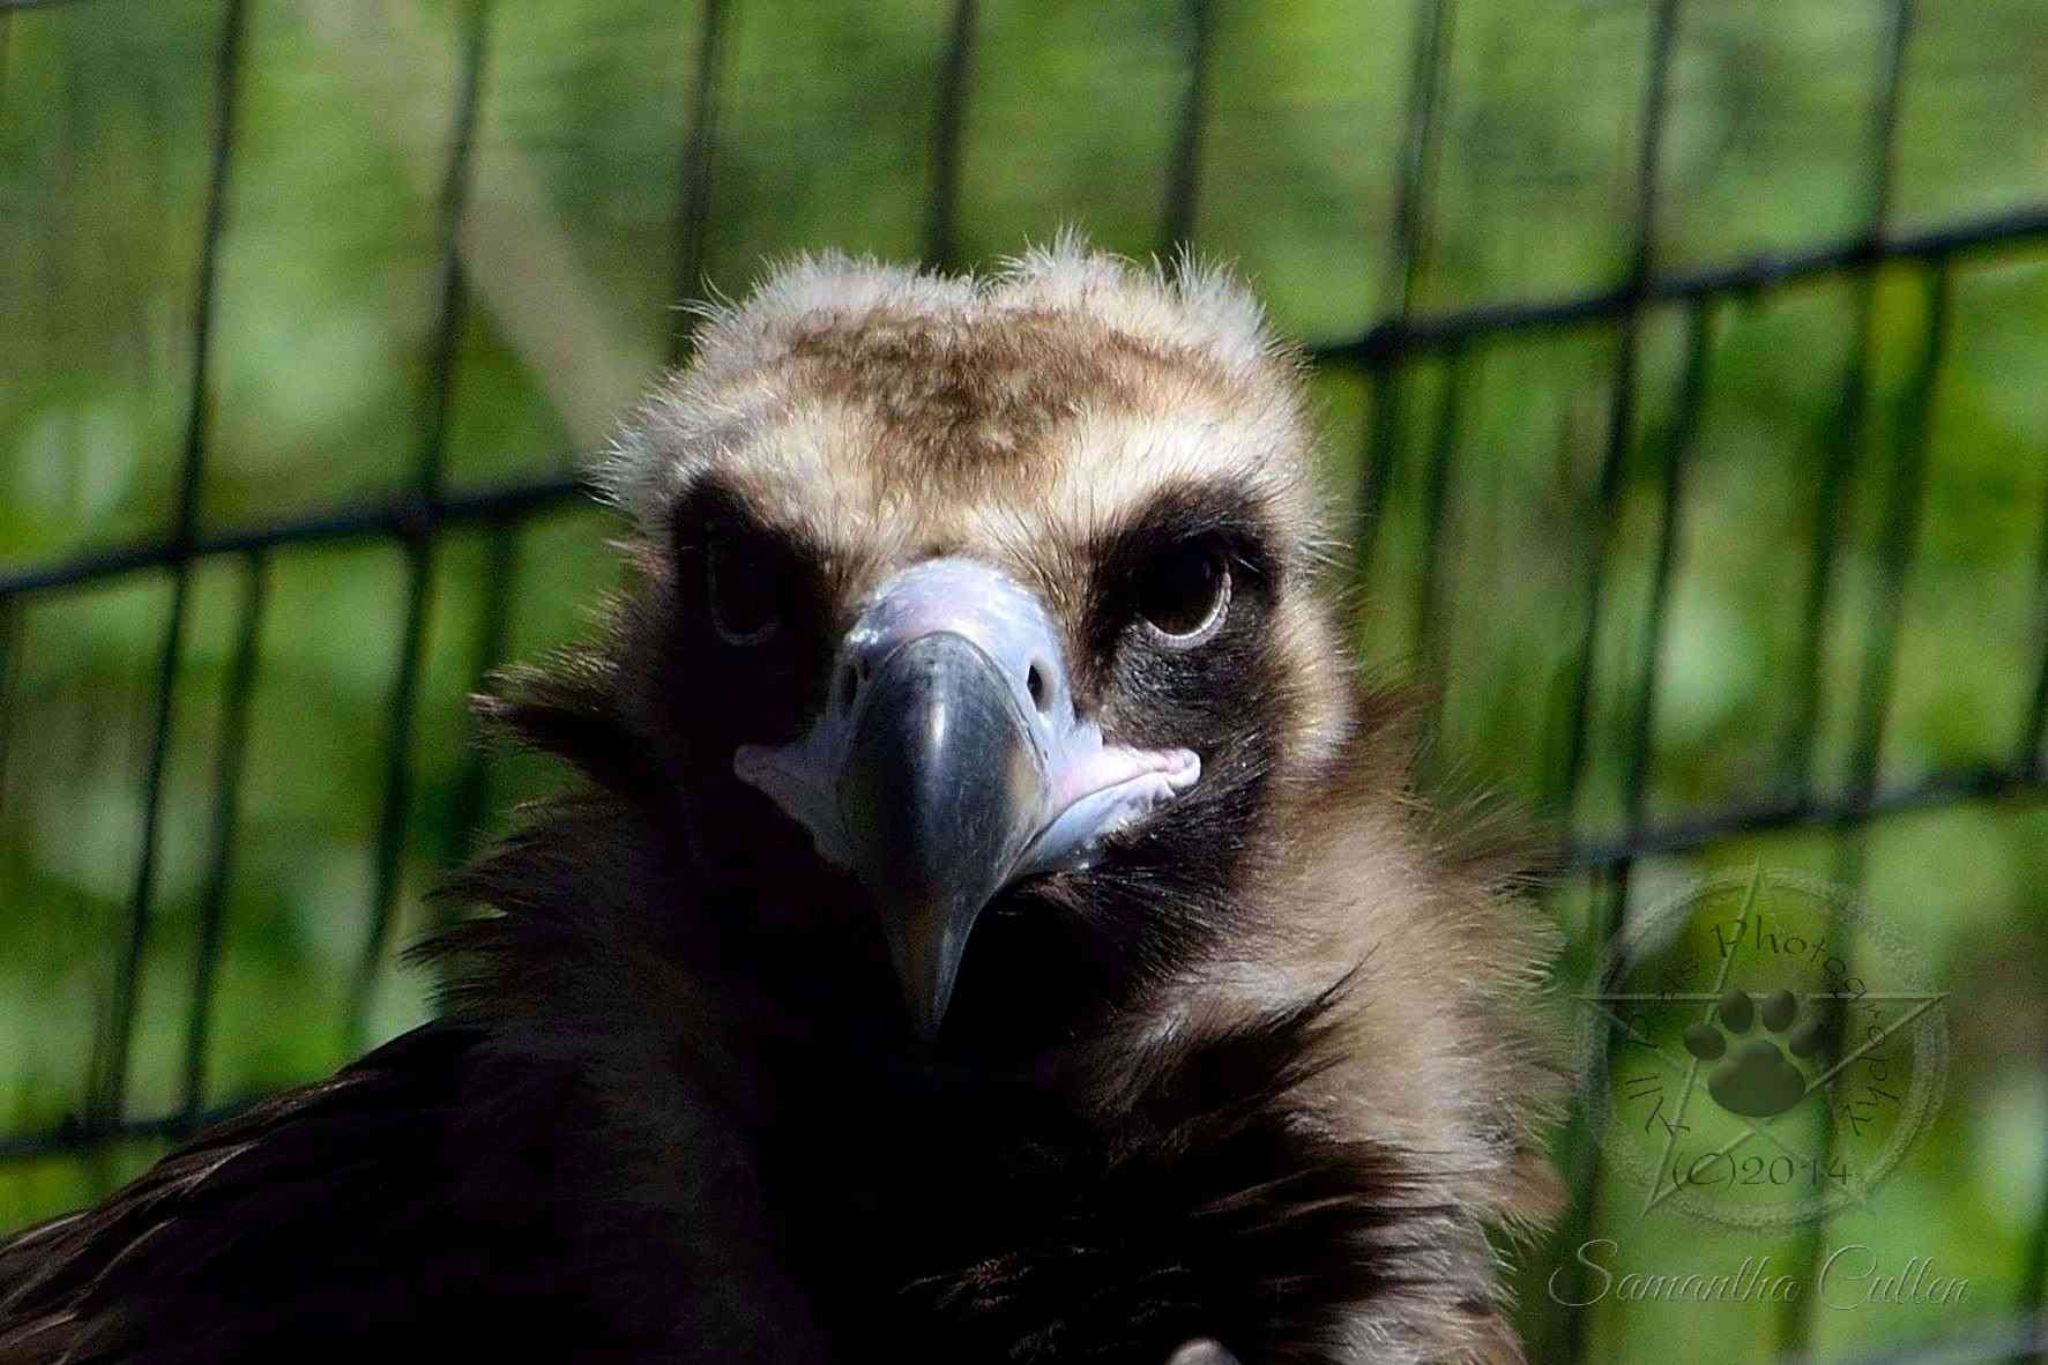 Vulture by Samantha Cullen